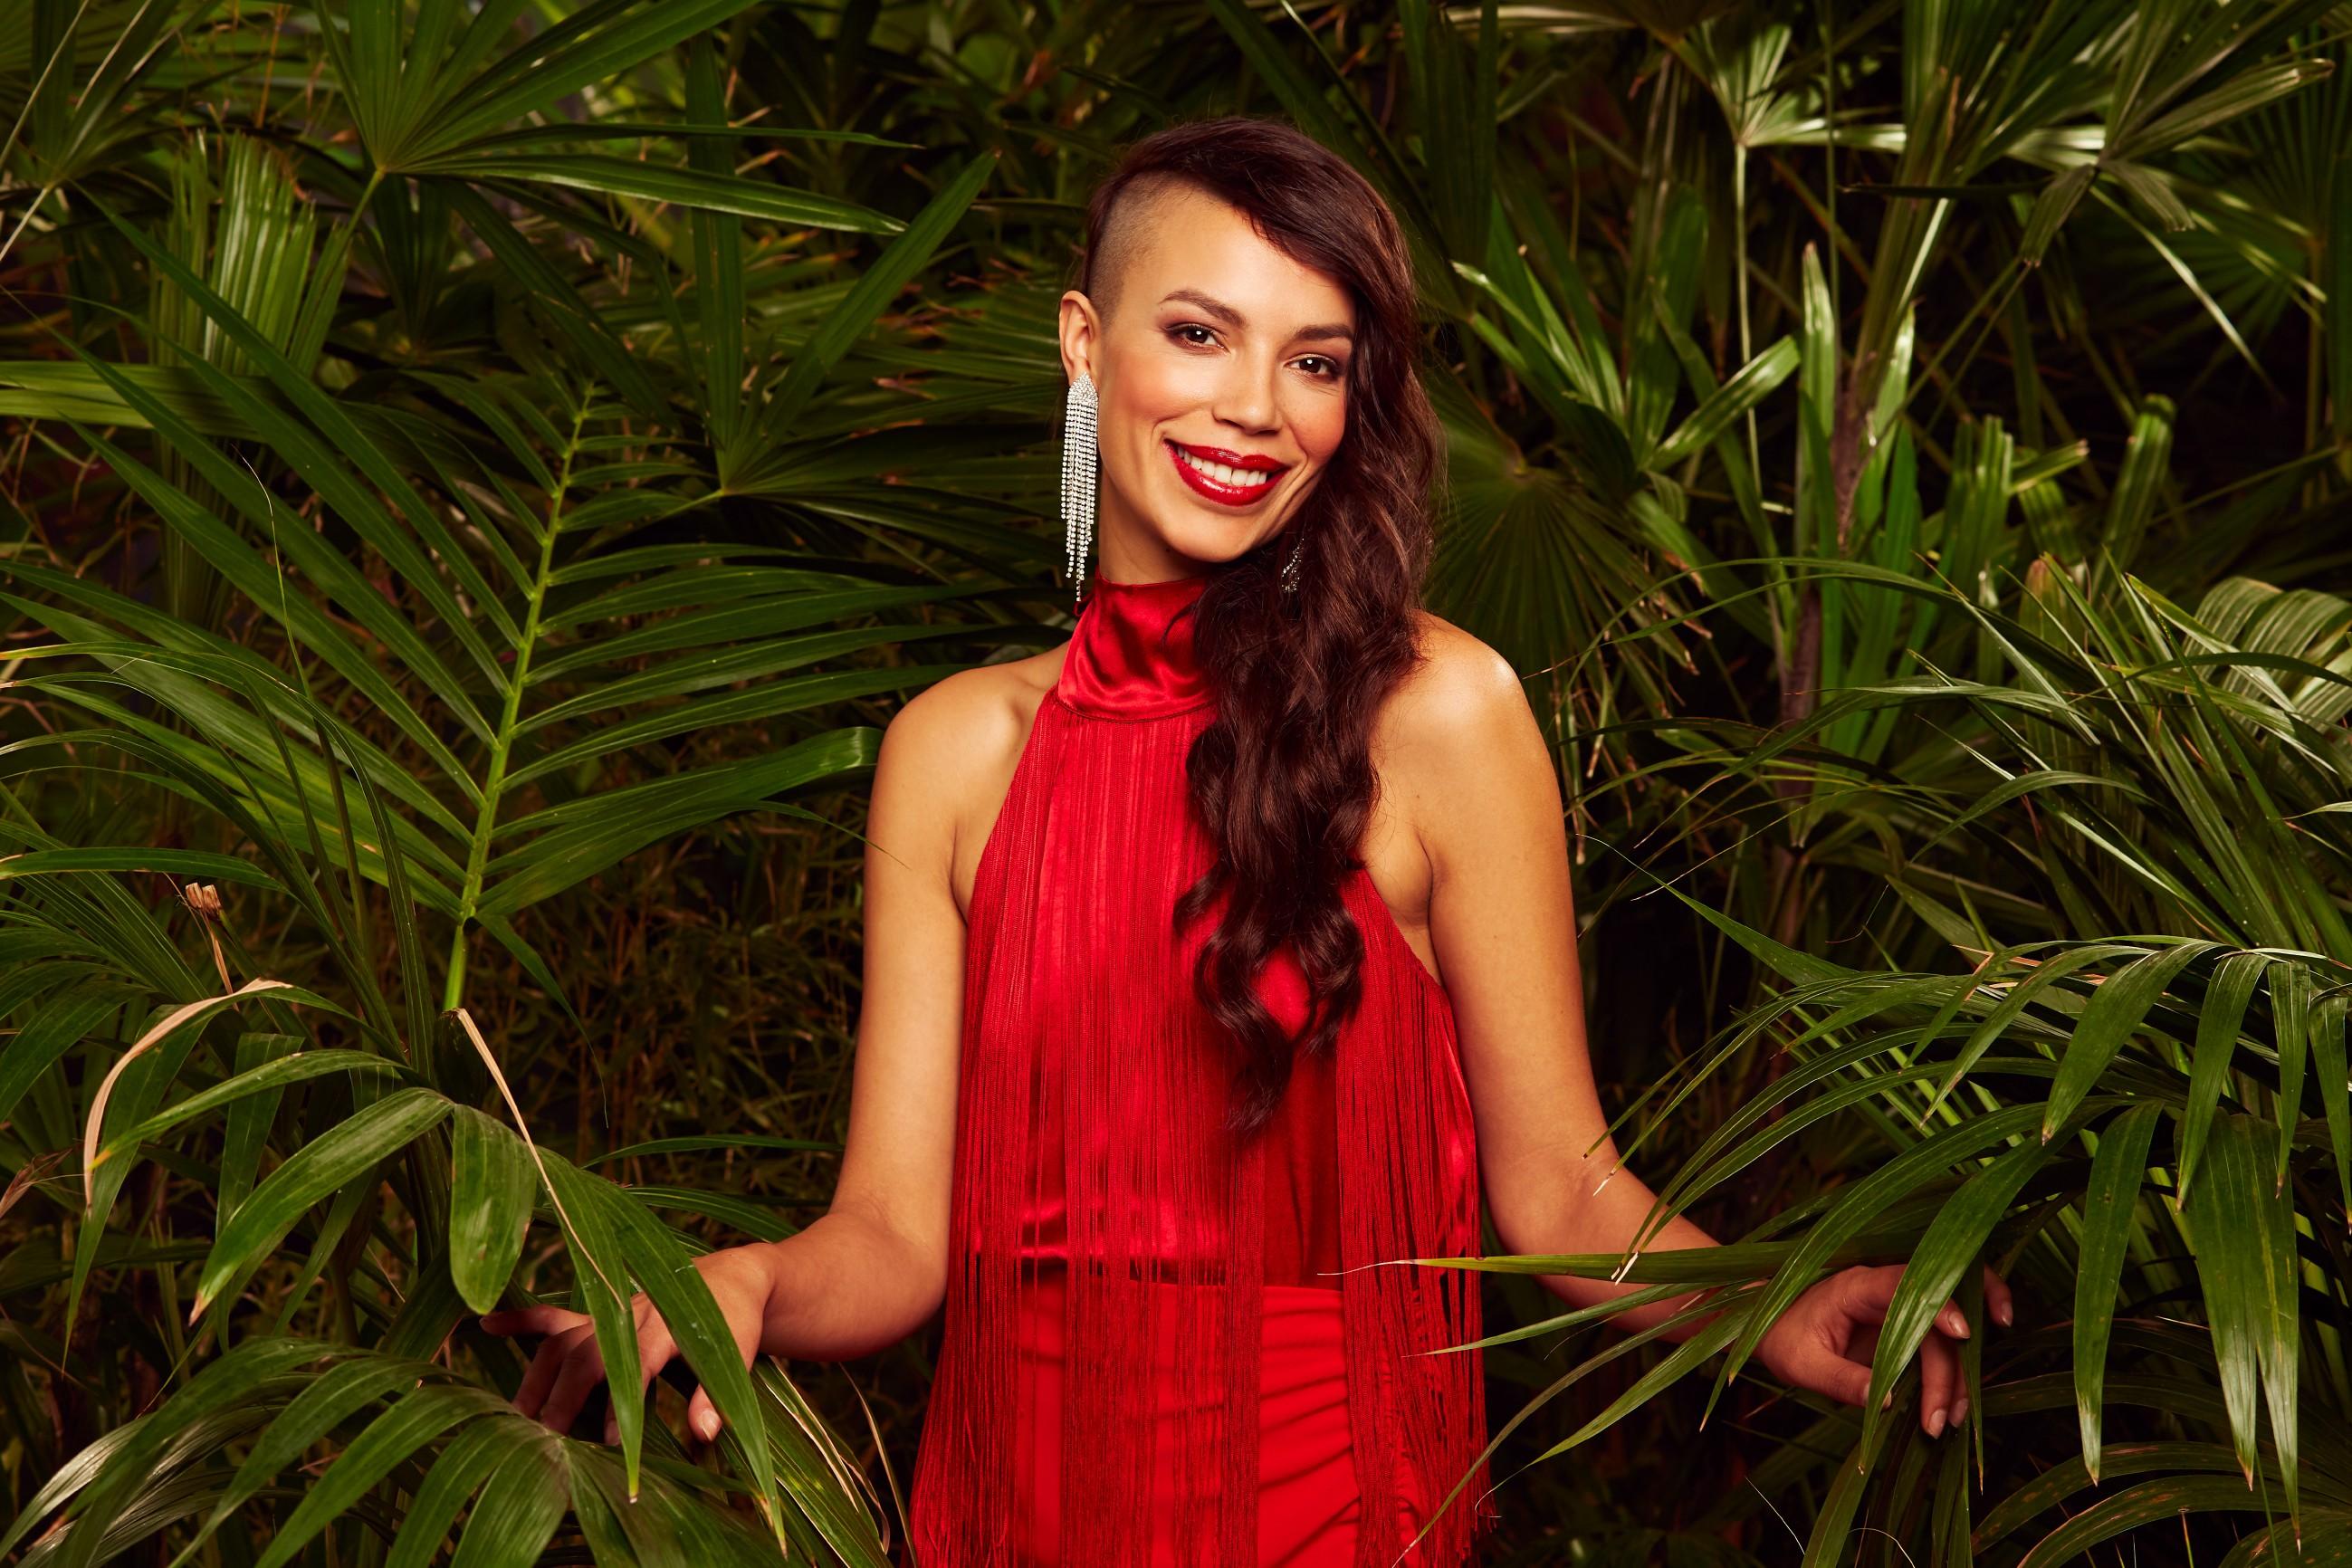 Alexandra Rietz nackt in der Promi Big Brother-Dusche